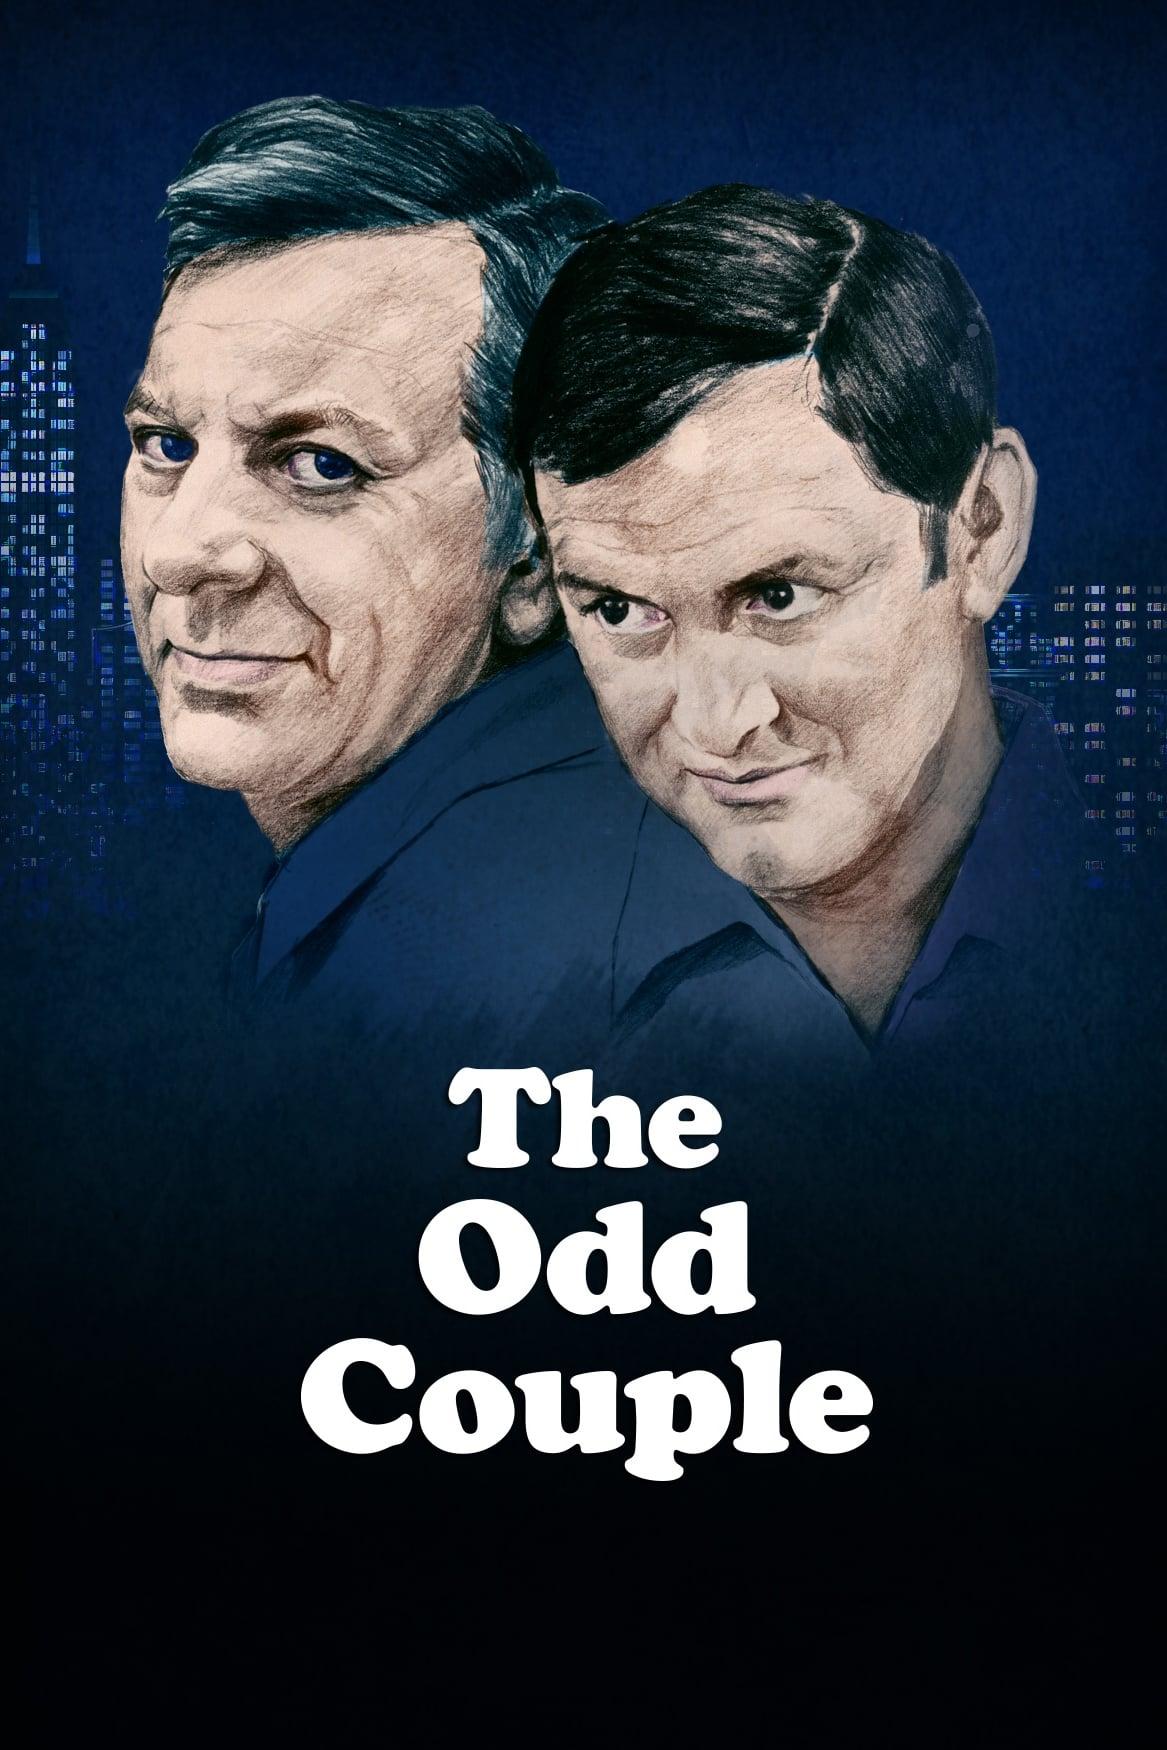 serie the odd couple 1970 en streaming vf complet filmstreaming hd com. Black Bedroom Furniture Sets. Home Design Ideas